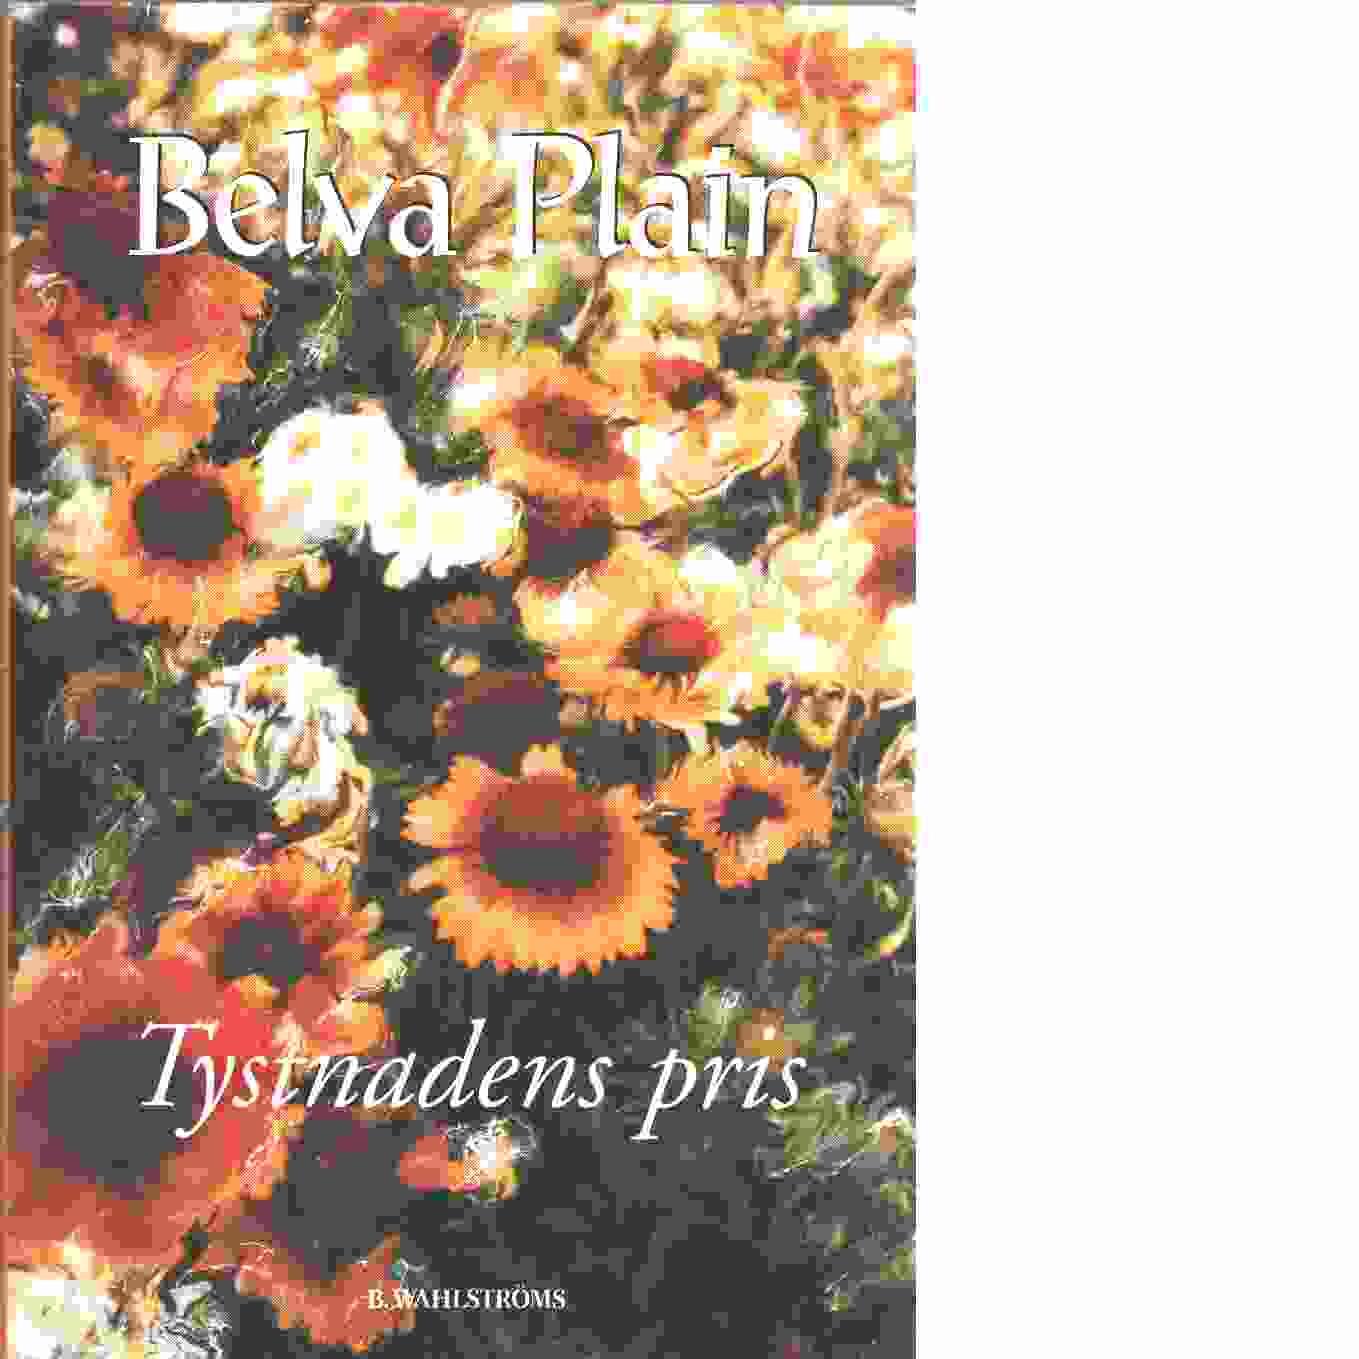 Tystnadens pris - Plain, Belva